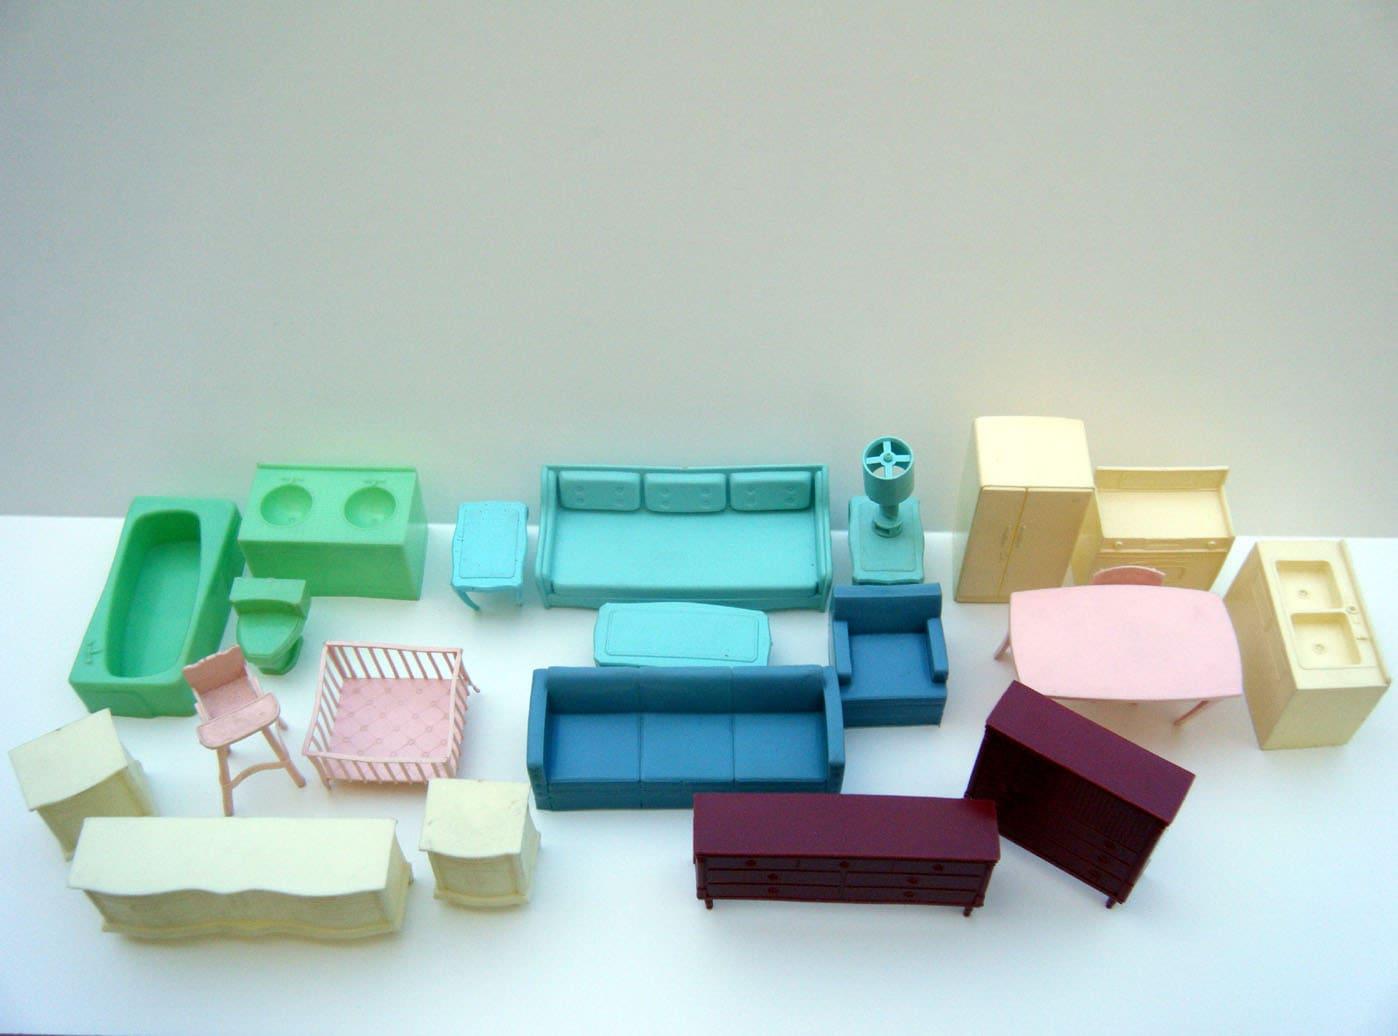 Vinatage Dollhouse Furniture Lot Of 23 Pieces Plastic